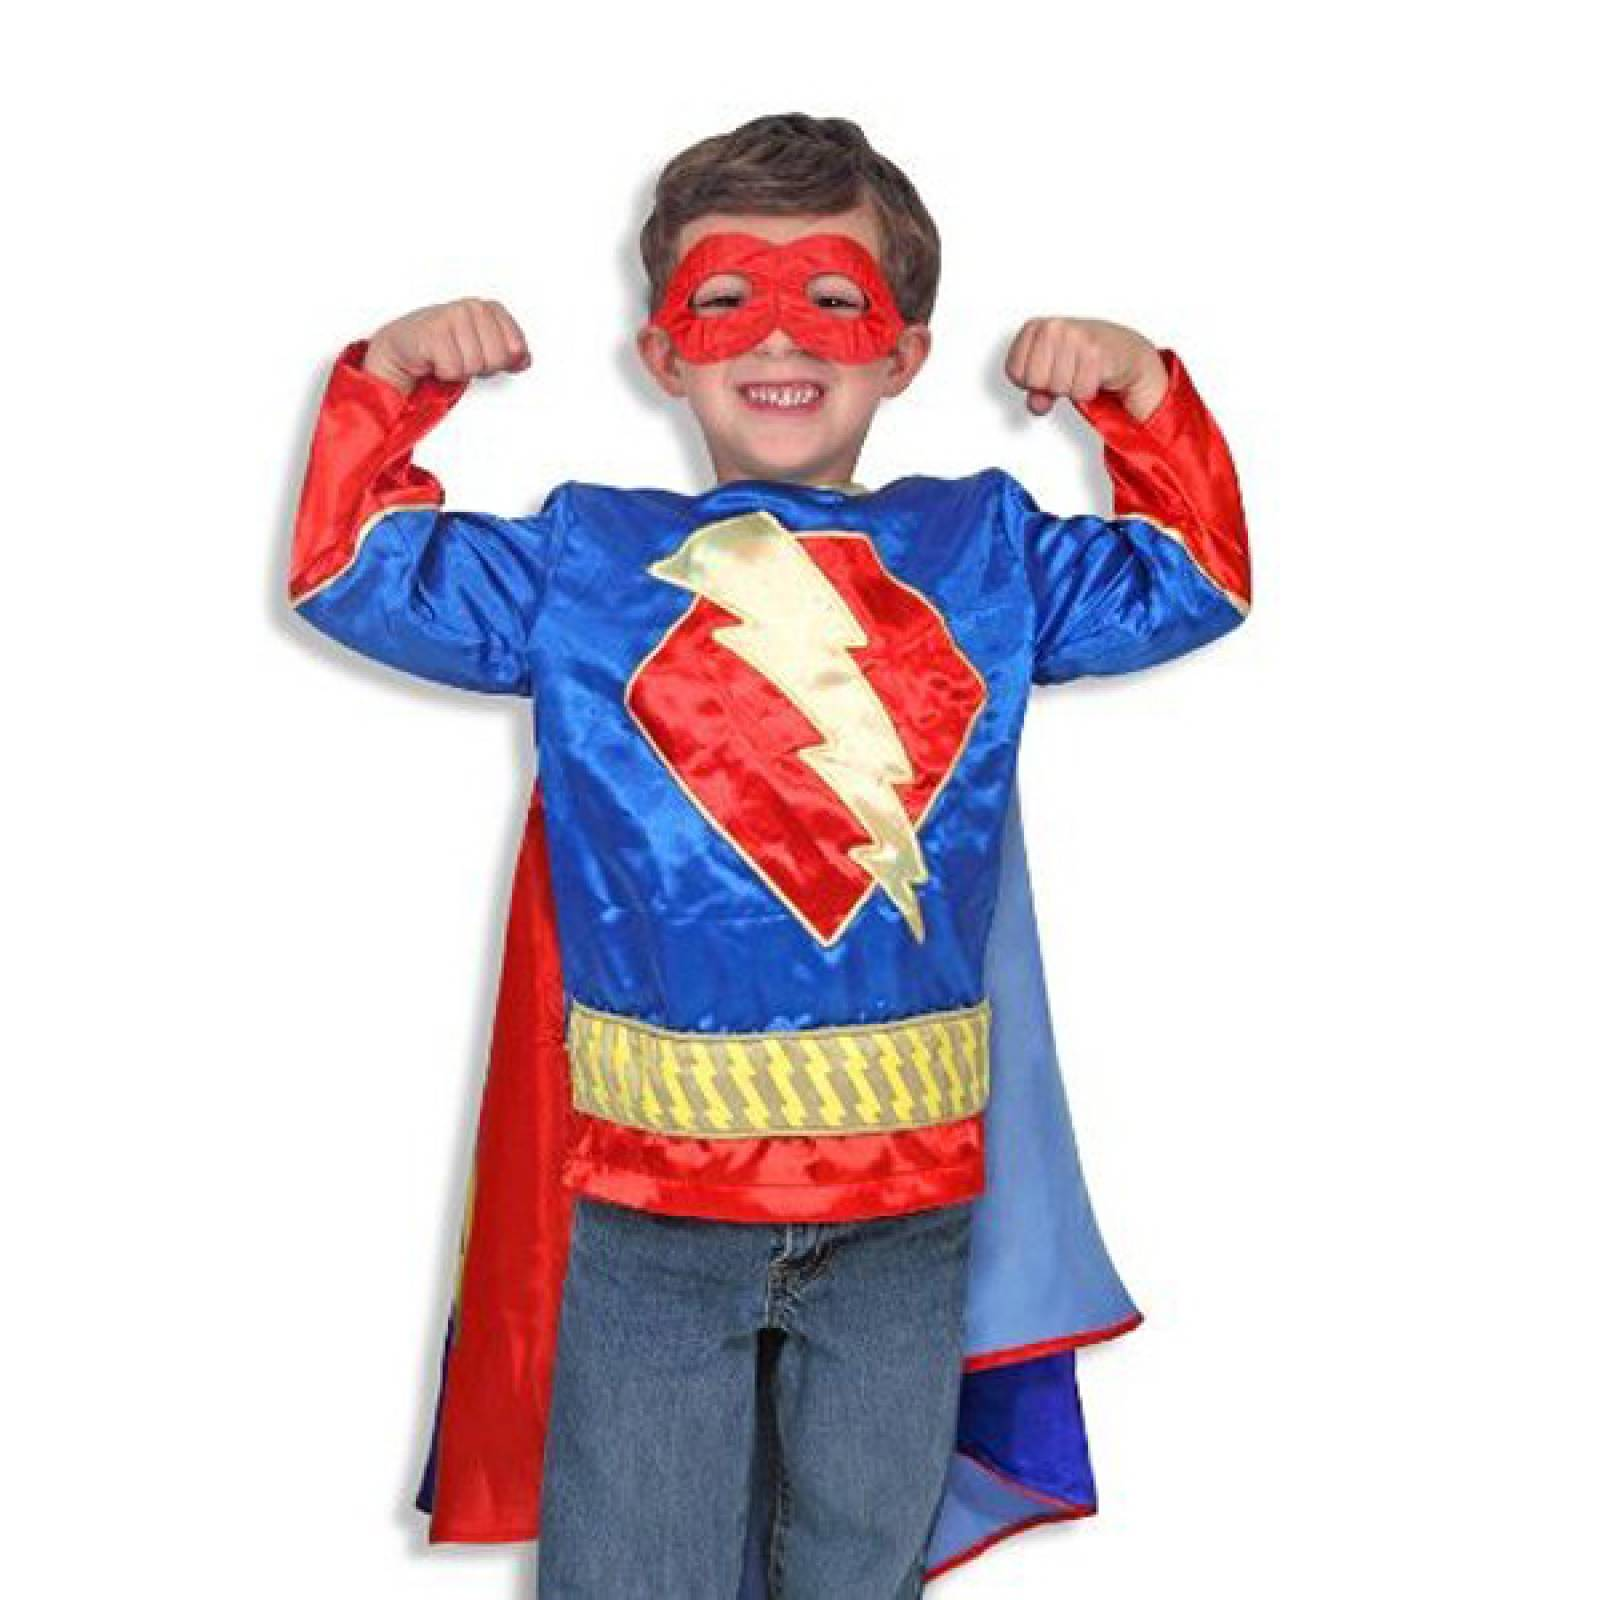 Superhero Fancy Dress Role Play Costume Set.